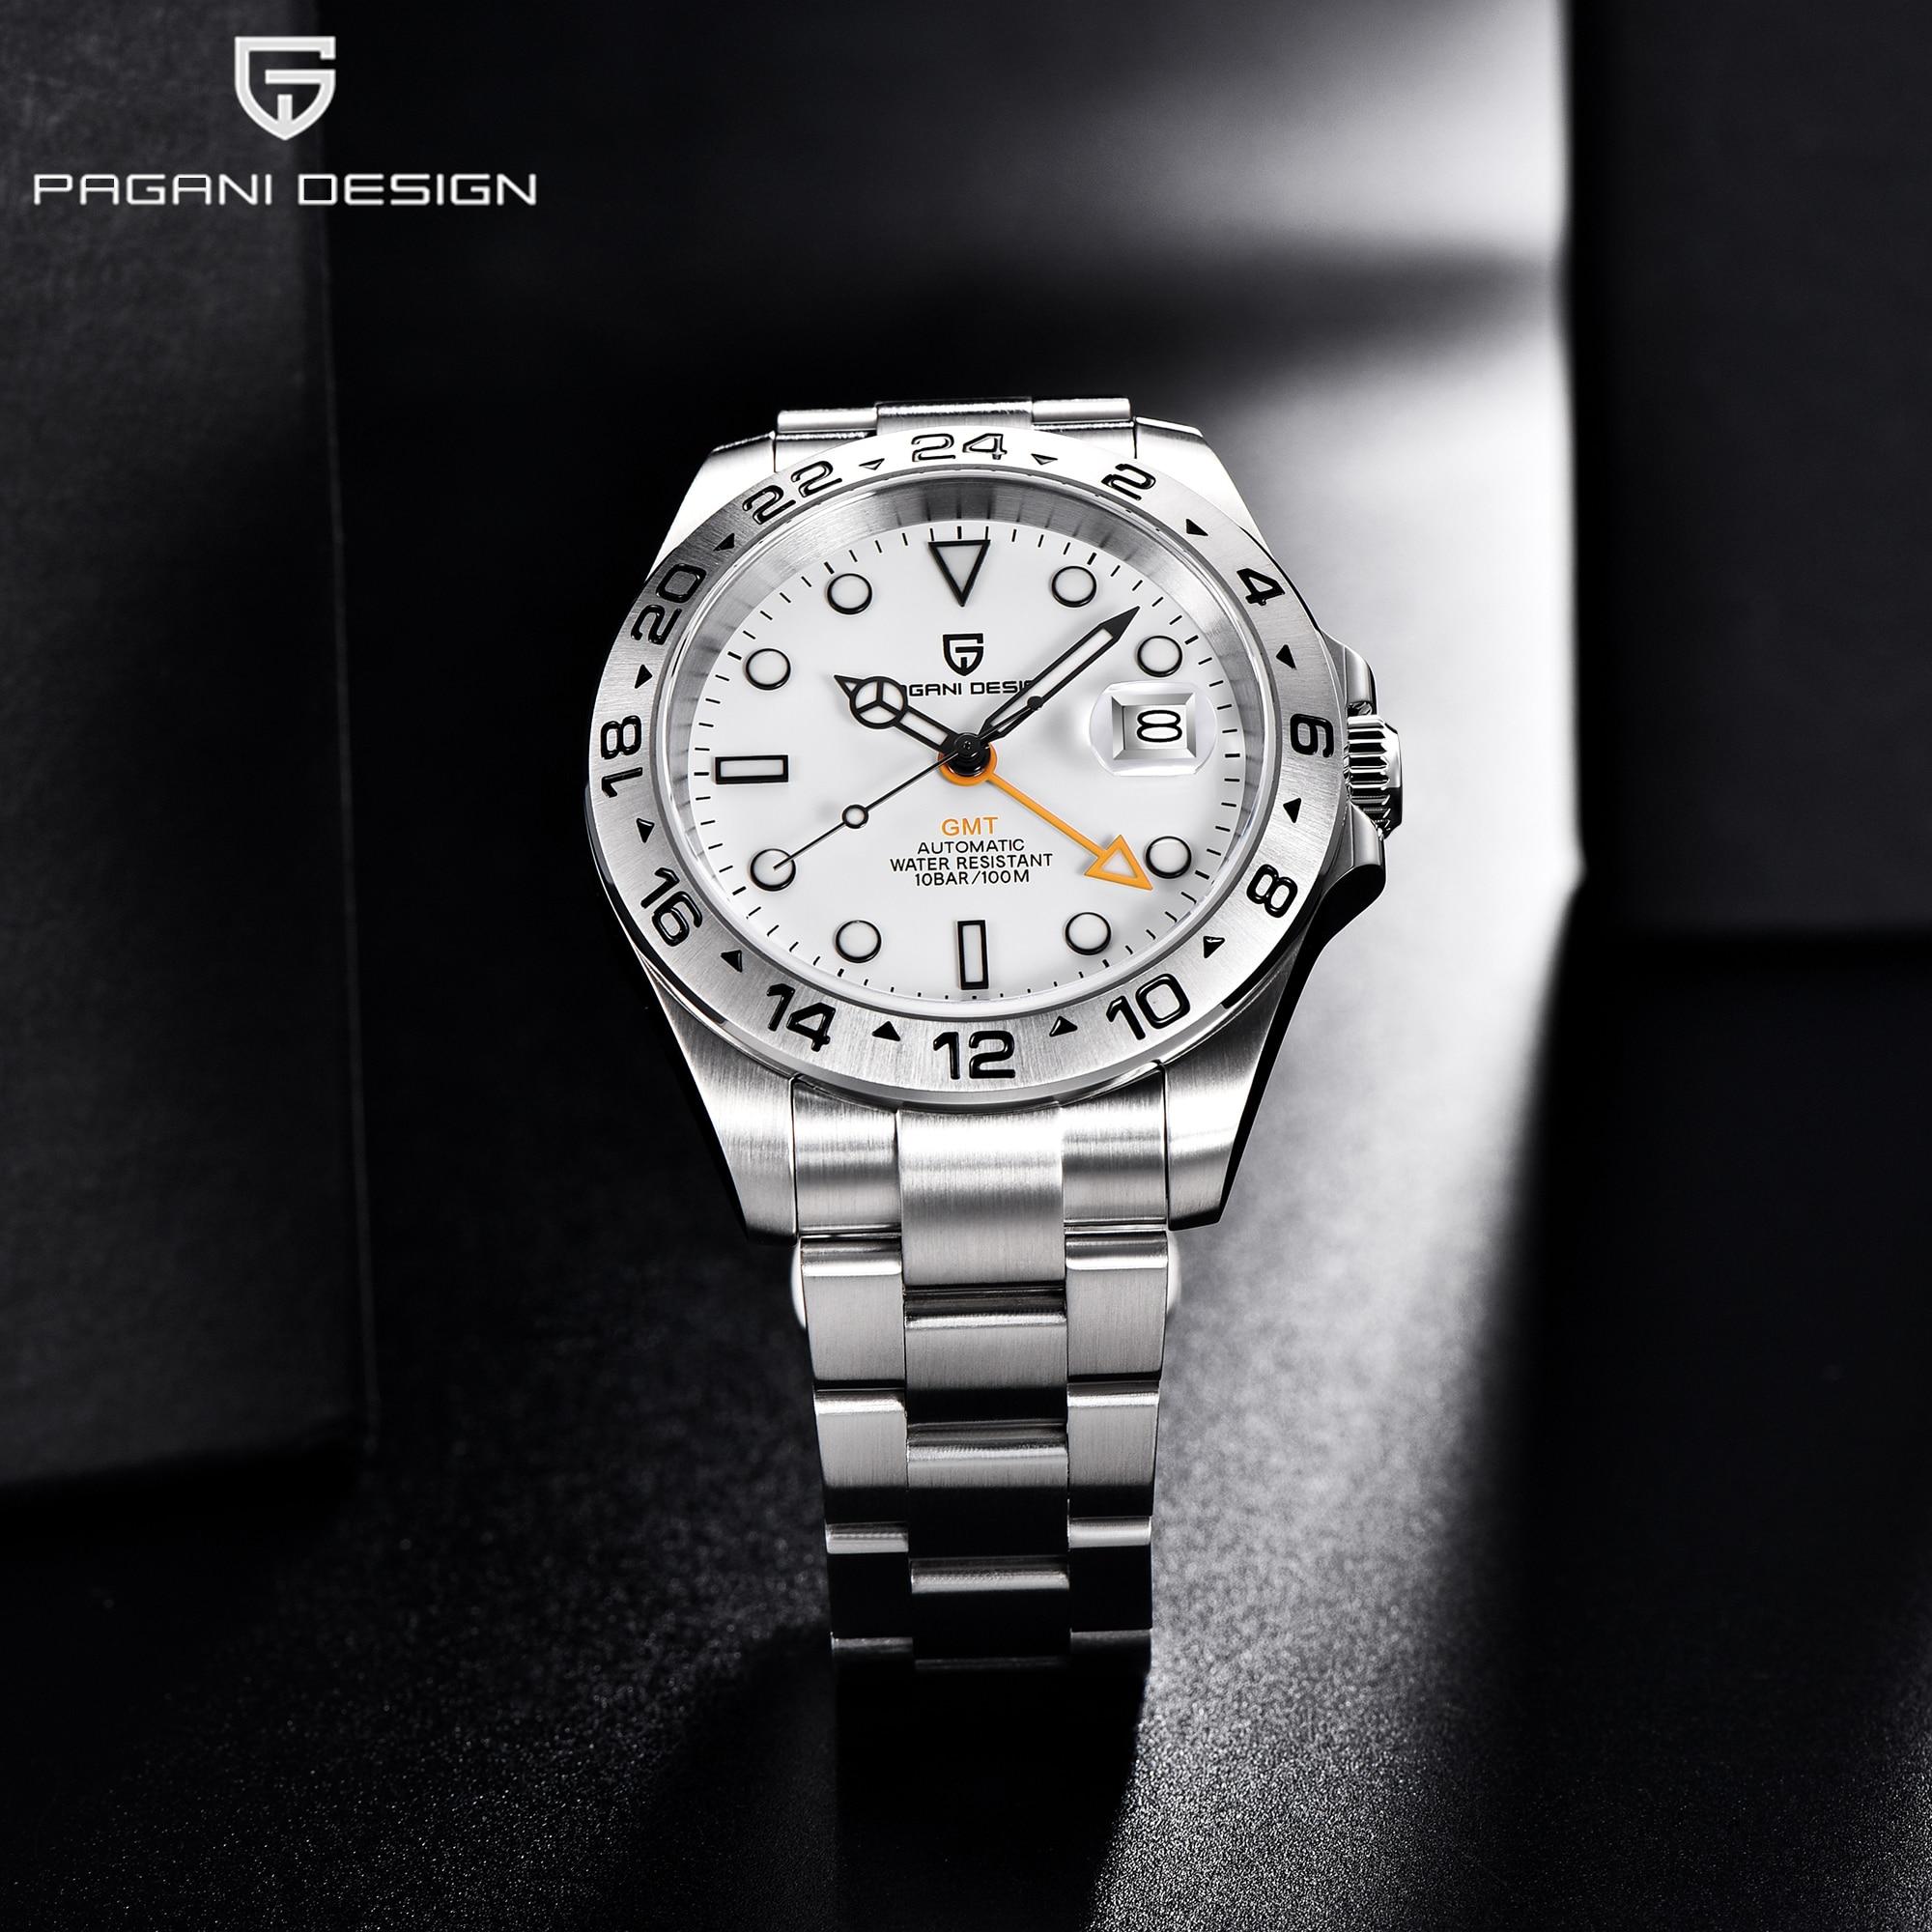 Pagani تصميم 2021 موضة جديدة بسيطة الرجال التلقائي ساعة ميكانيكية مقاوم للماء الياقوت الفولاذ المقاوم للصدأ GMT ساعة Reloj Hombre